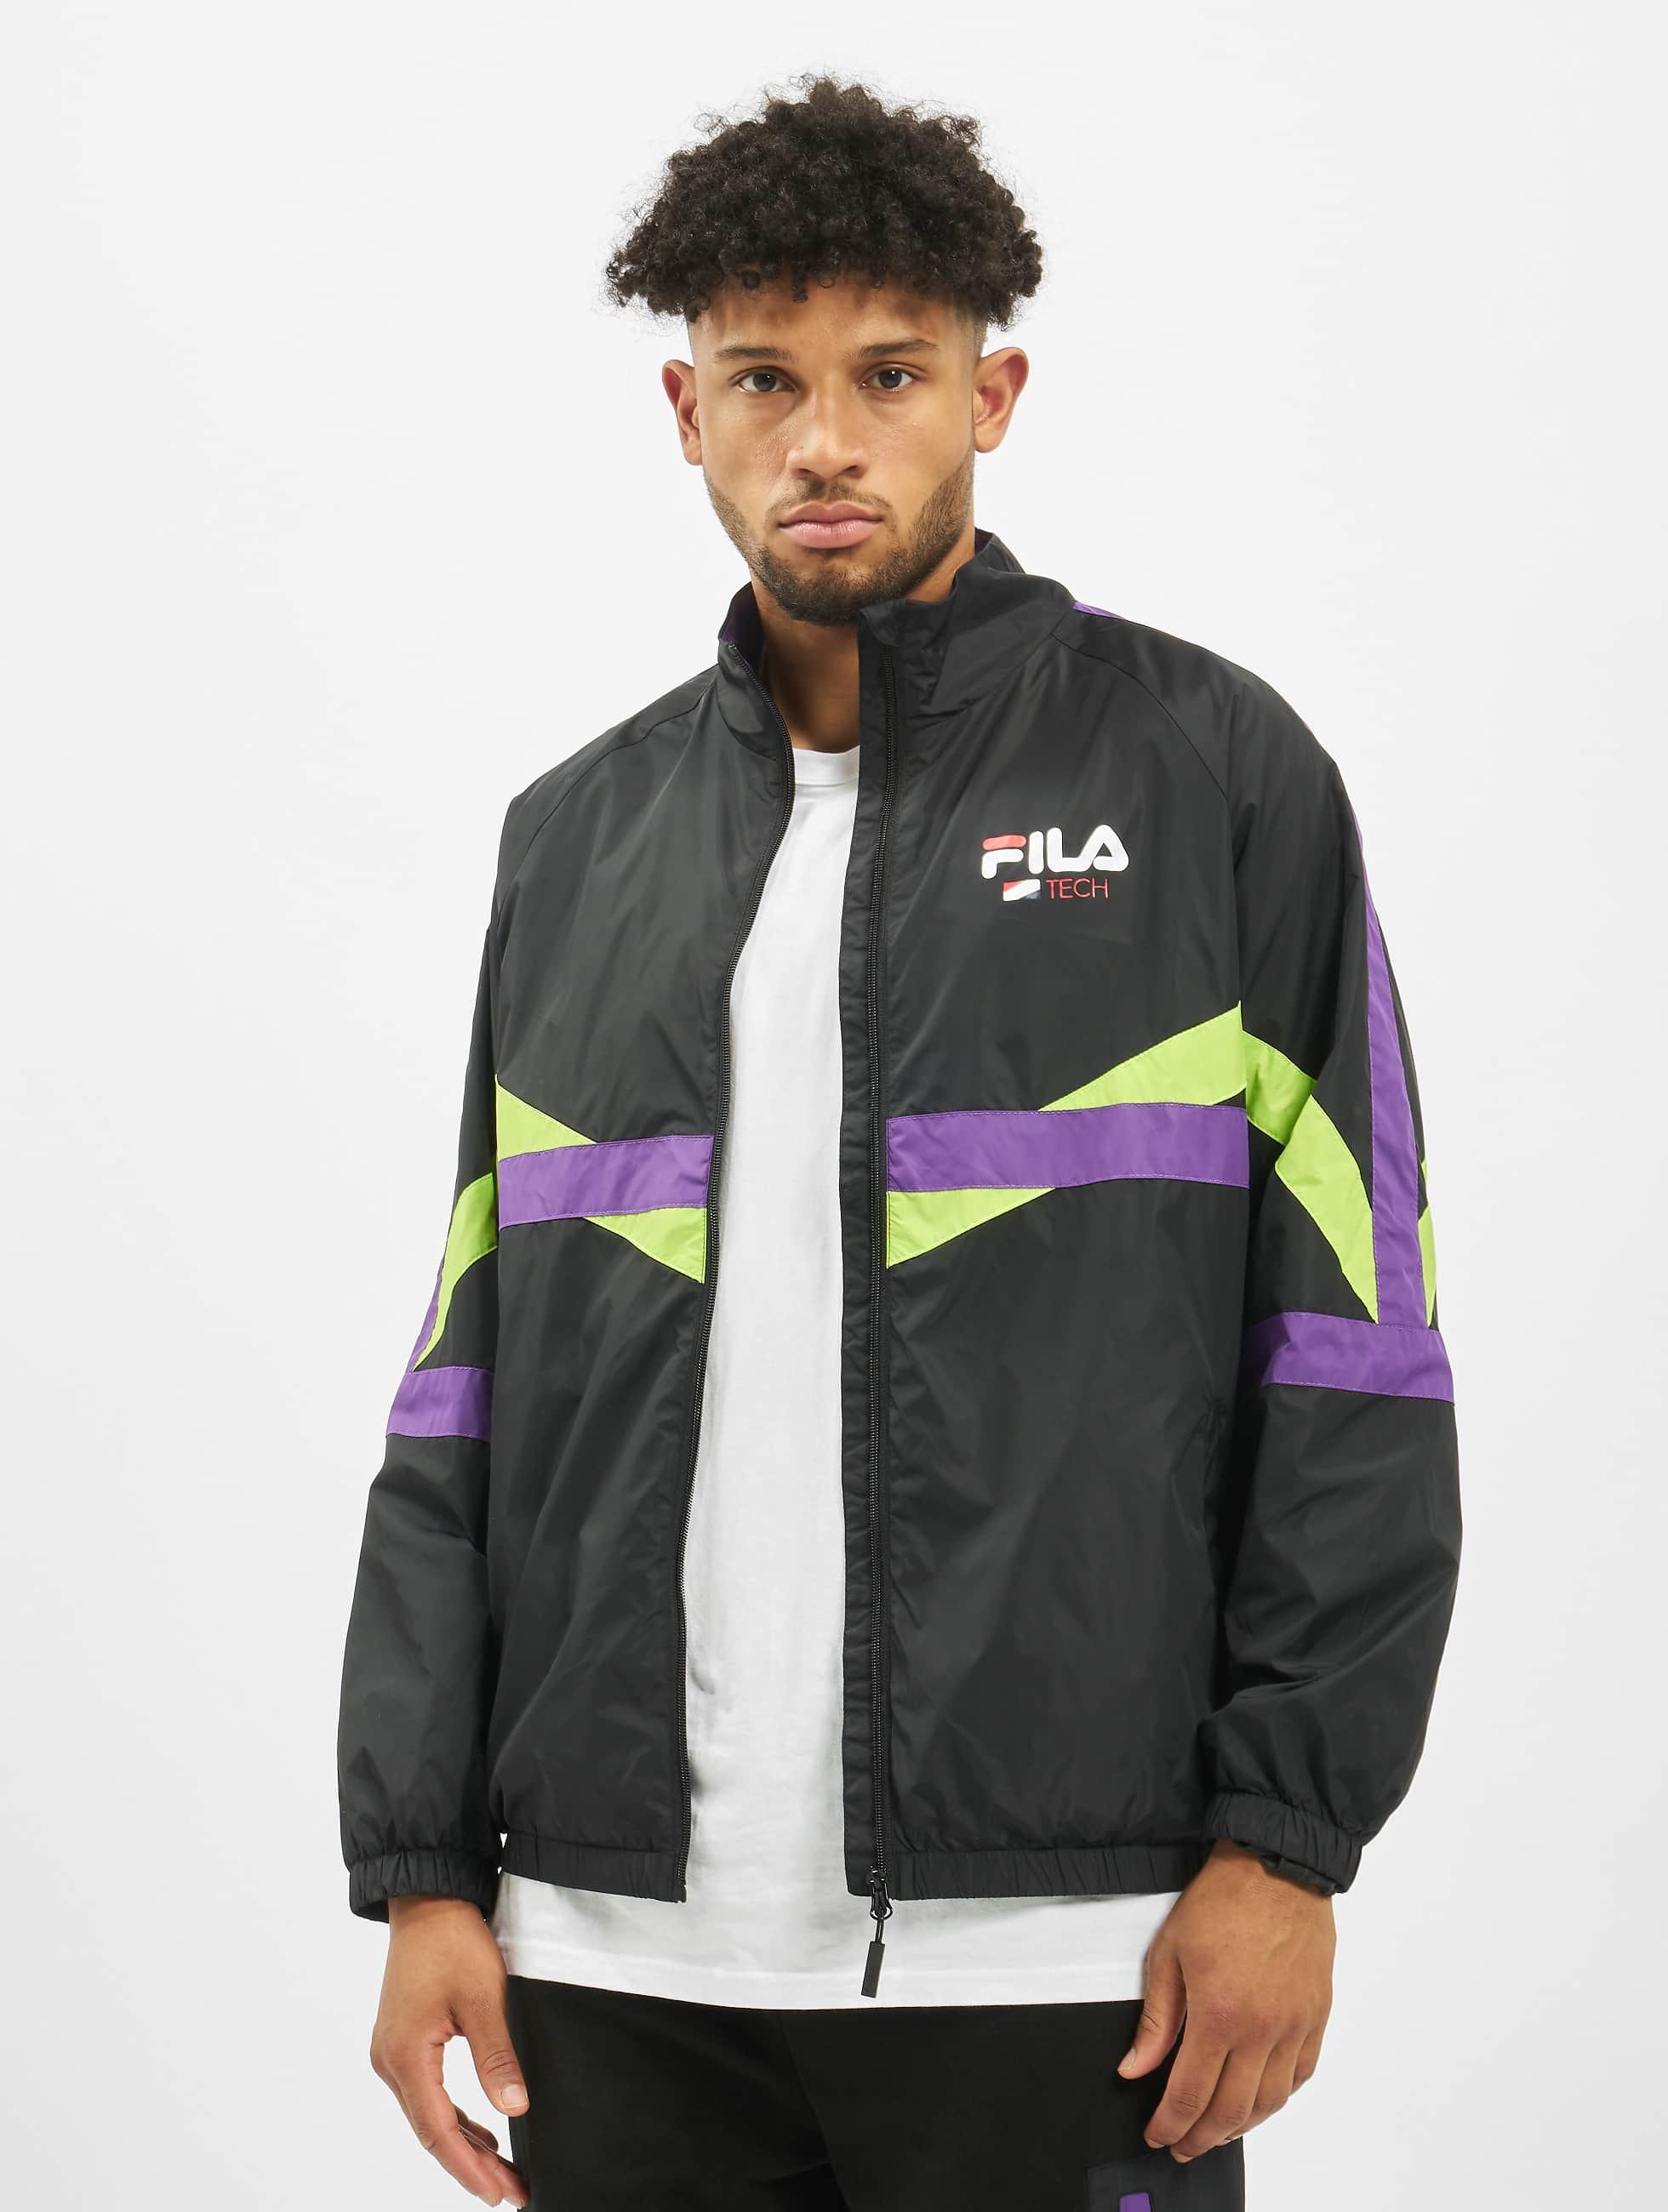 Fila Urban Line Reign Track Jacket BlackTillandsia PurpleAcid Lime